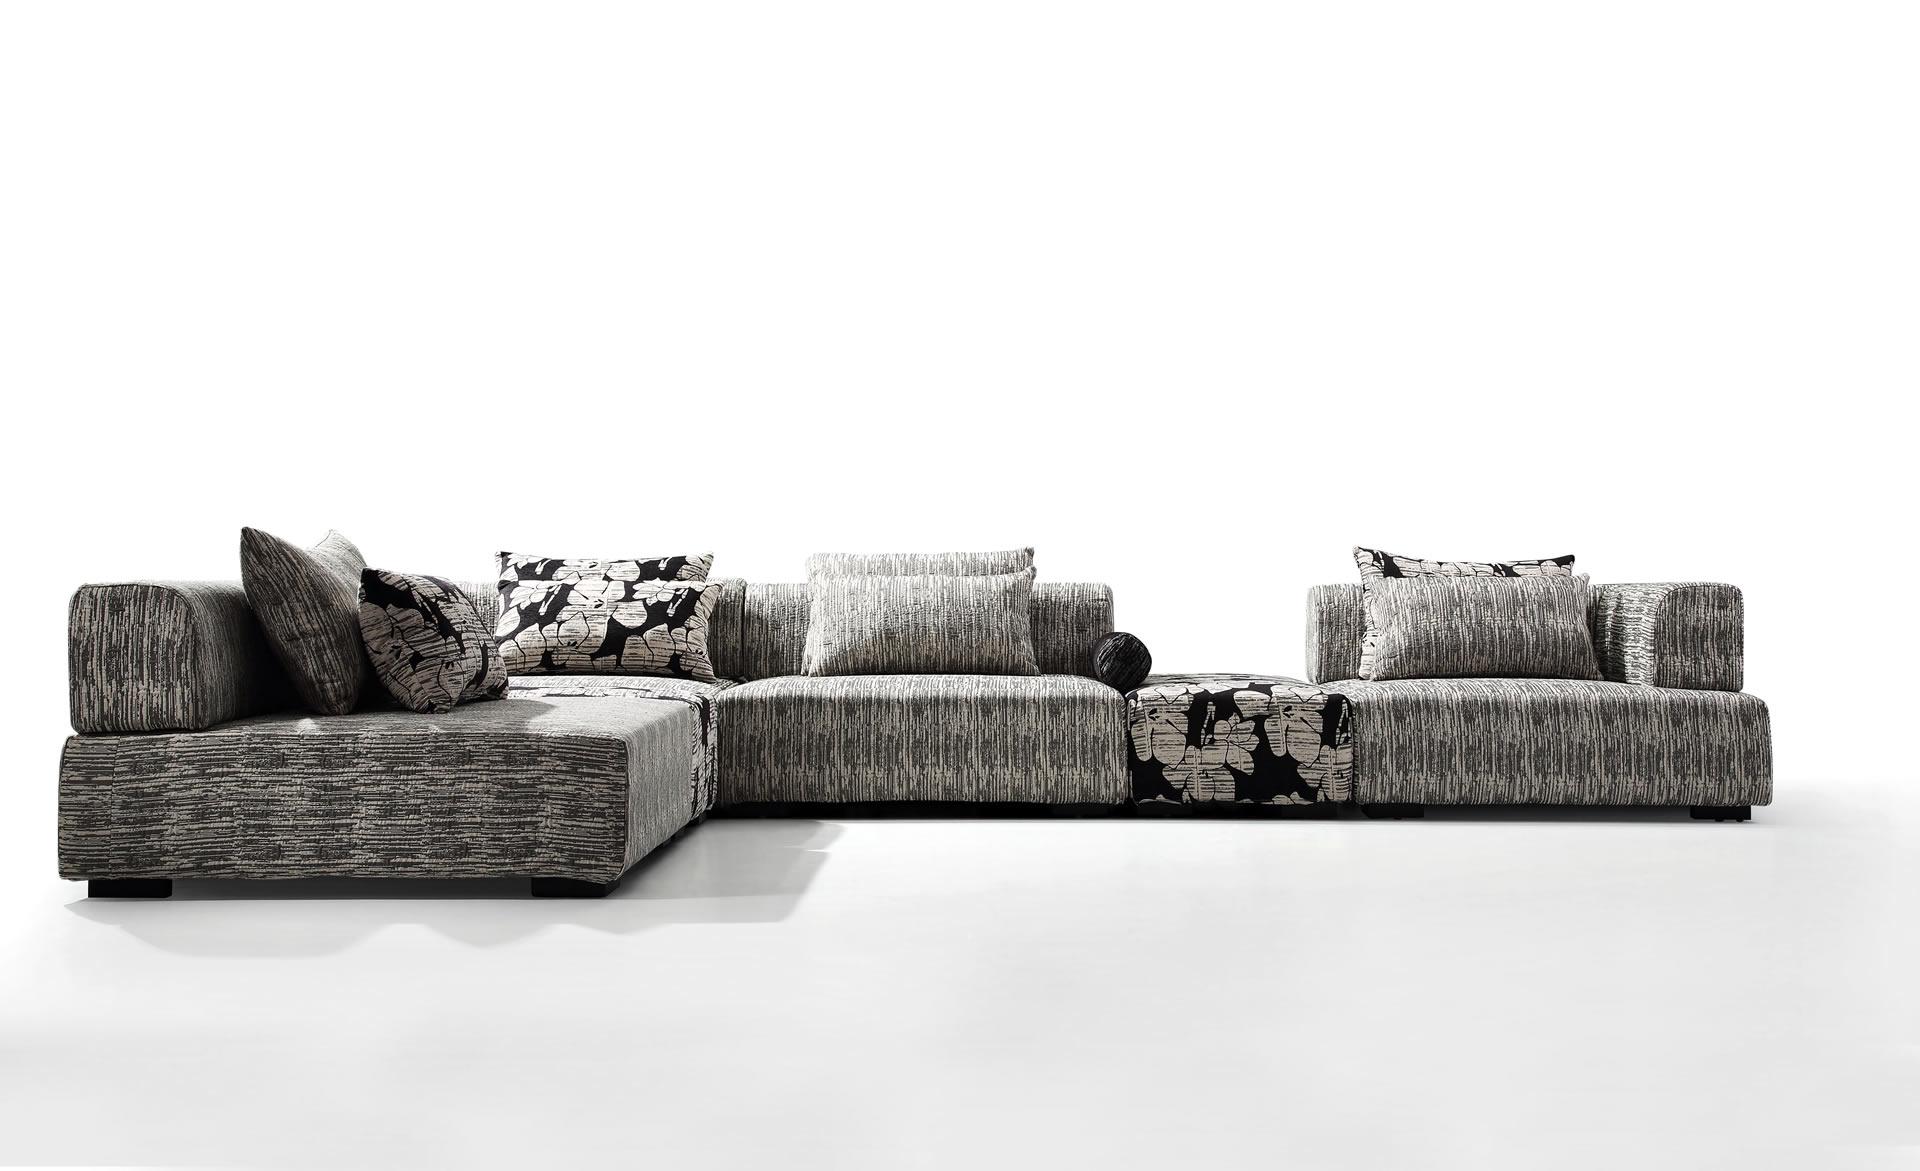 wunderbar boxspringbett selber zusammenstellen bild. Black Bedroom Furniture Sets. Home Design Ideas